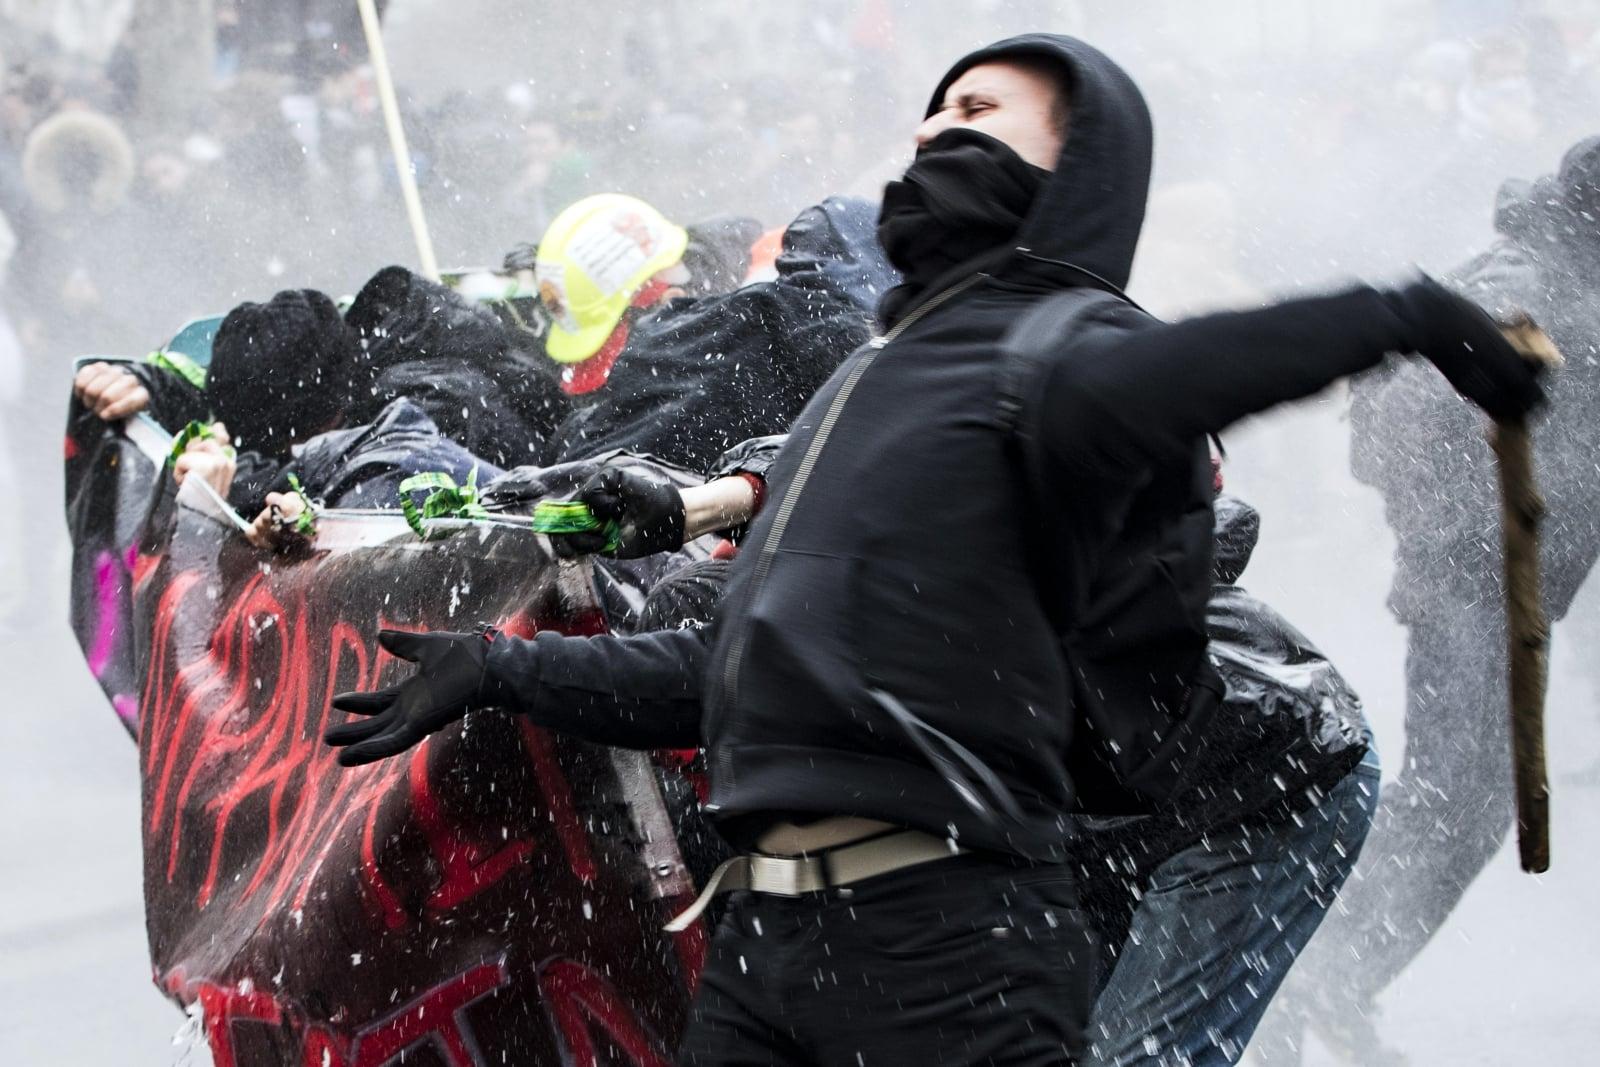 Francuscy protestujący fot. EPA/ETIENNE LAURENT